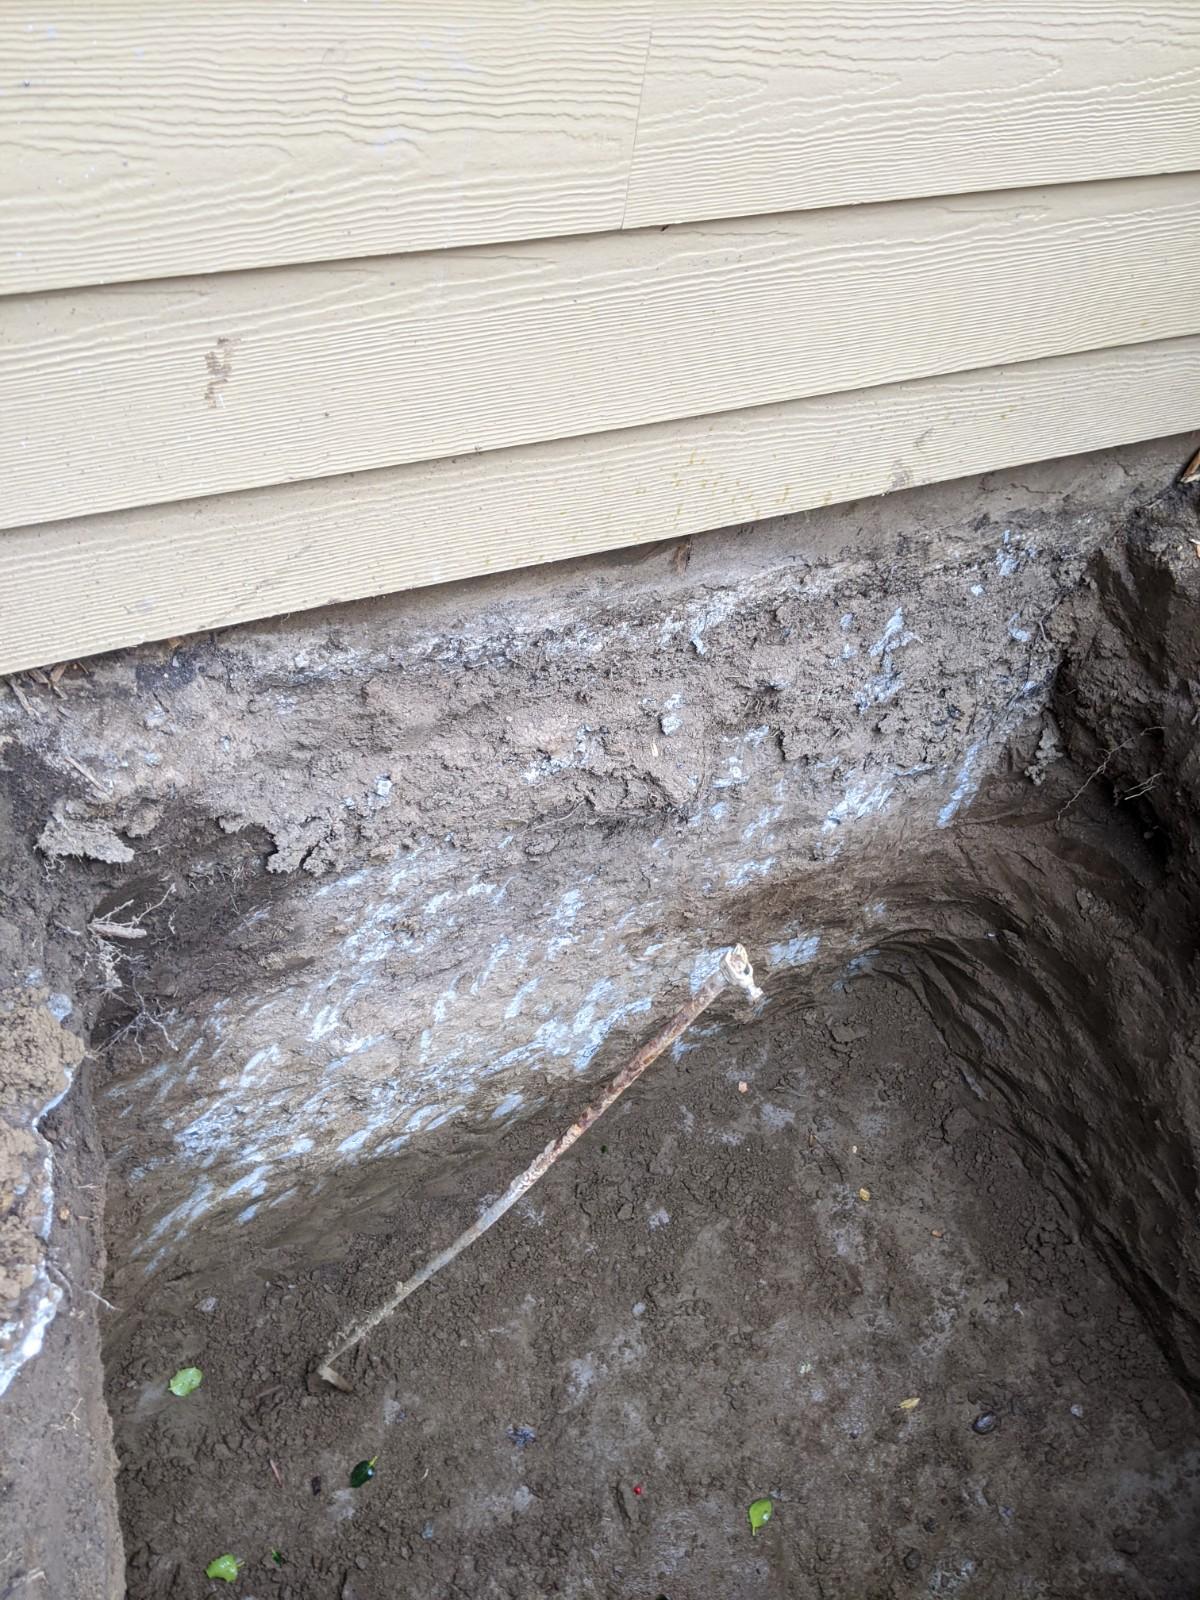 Fastening Egress Window Well to Uneven Foundation-img_20200107_151247.jpg